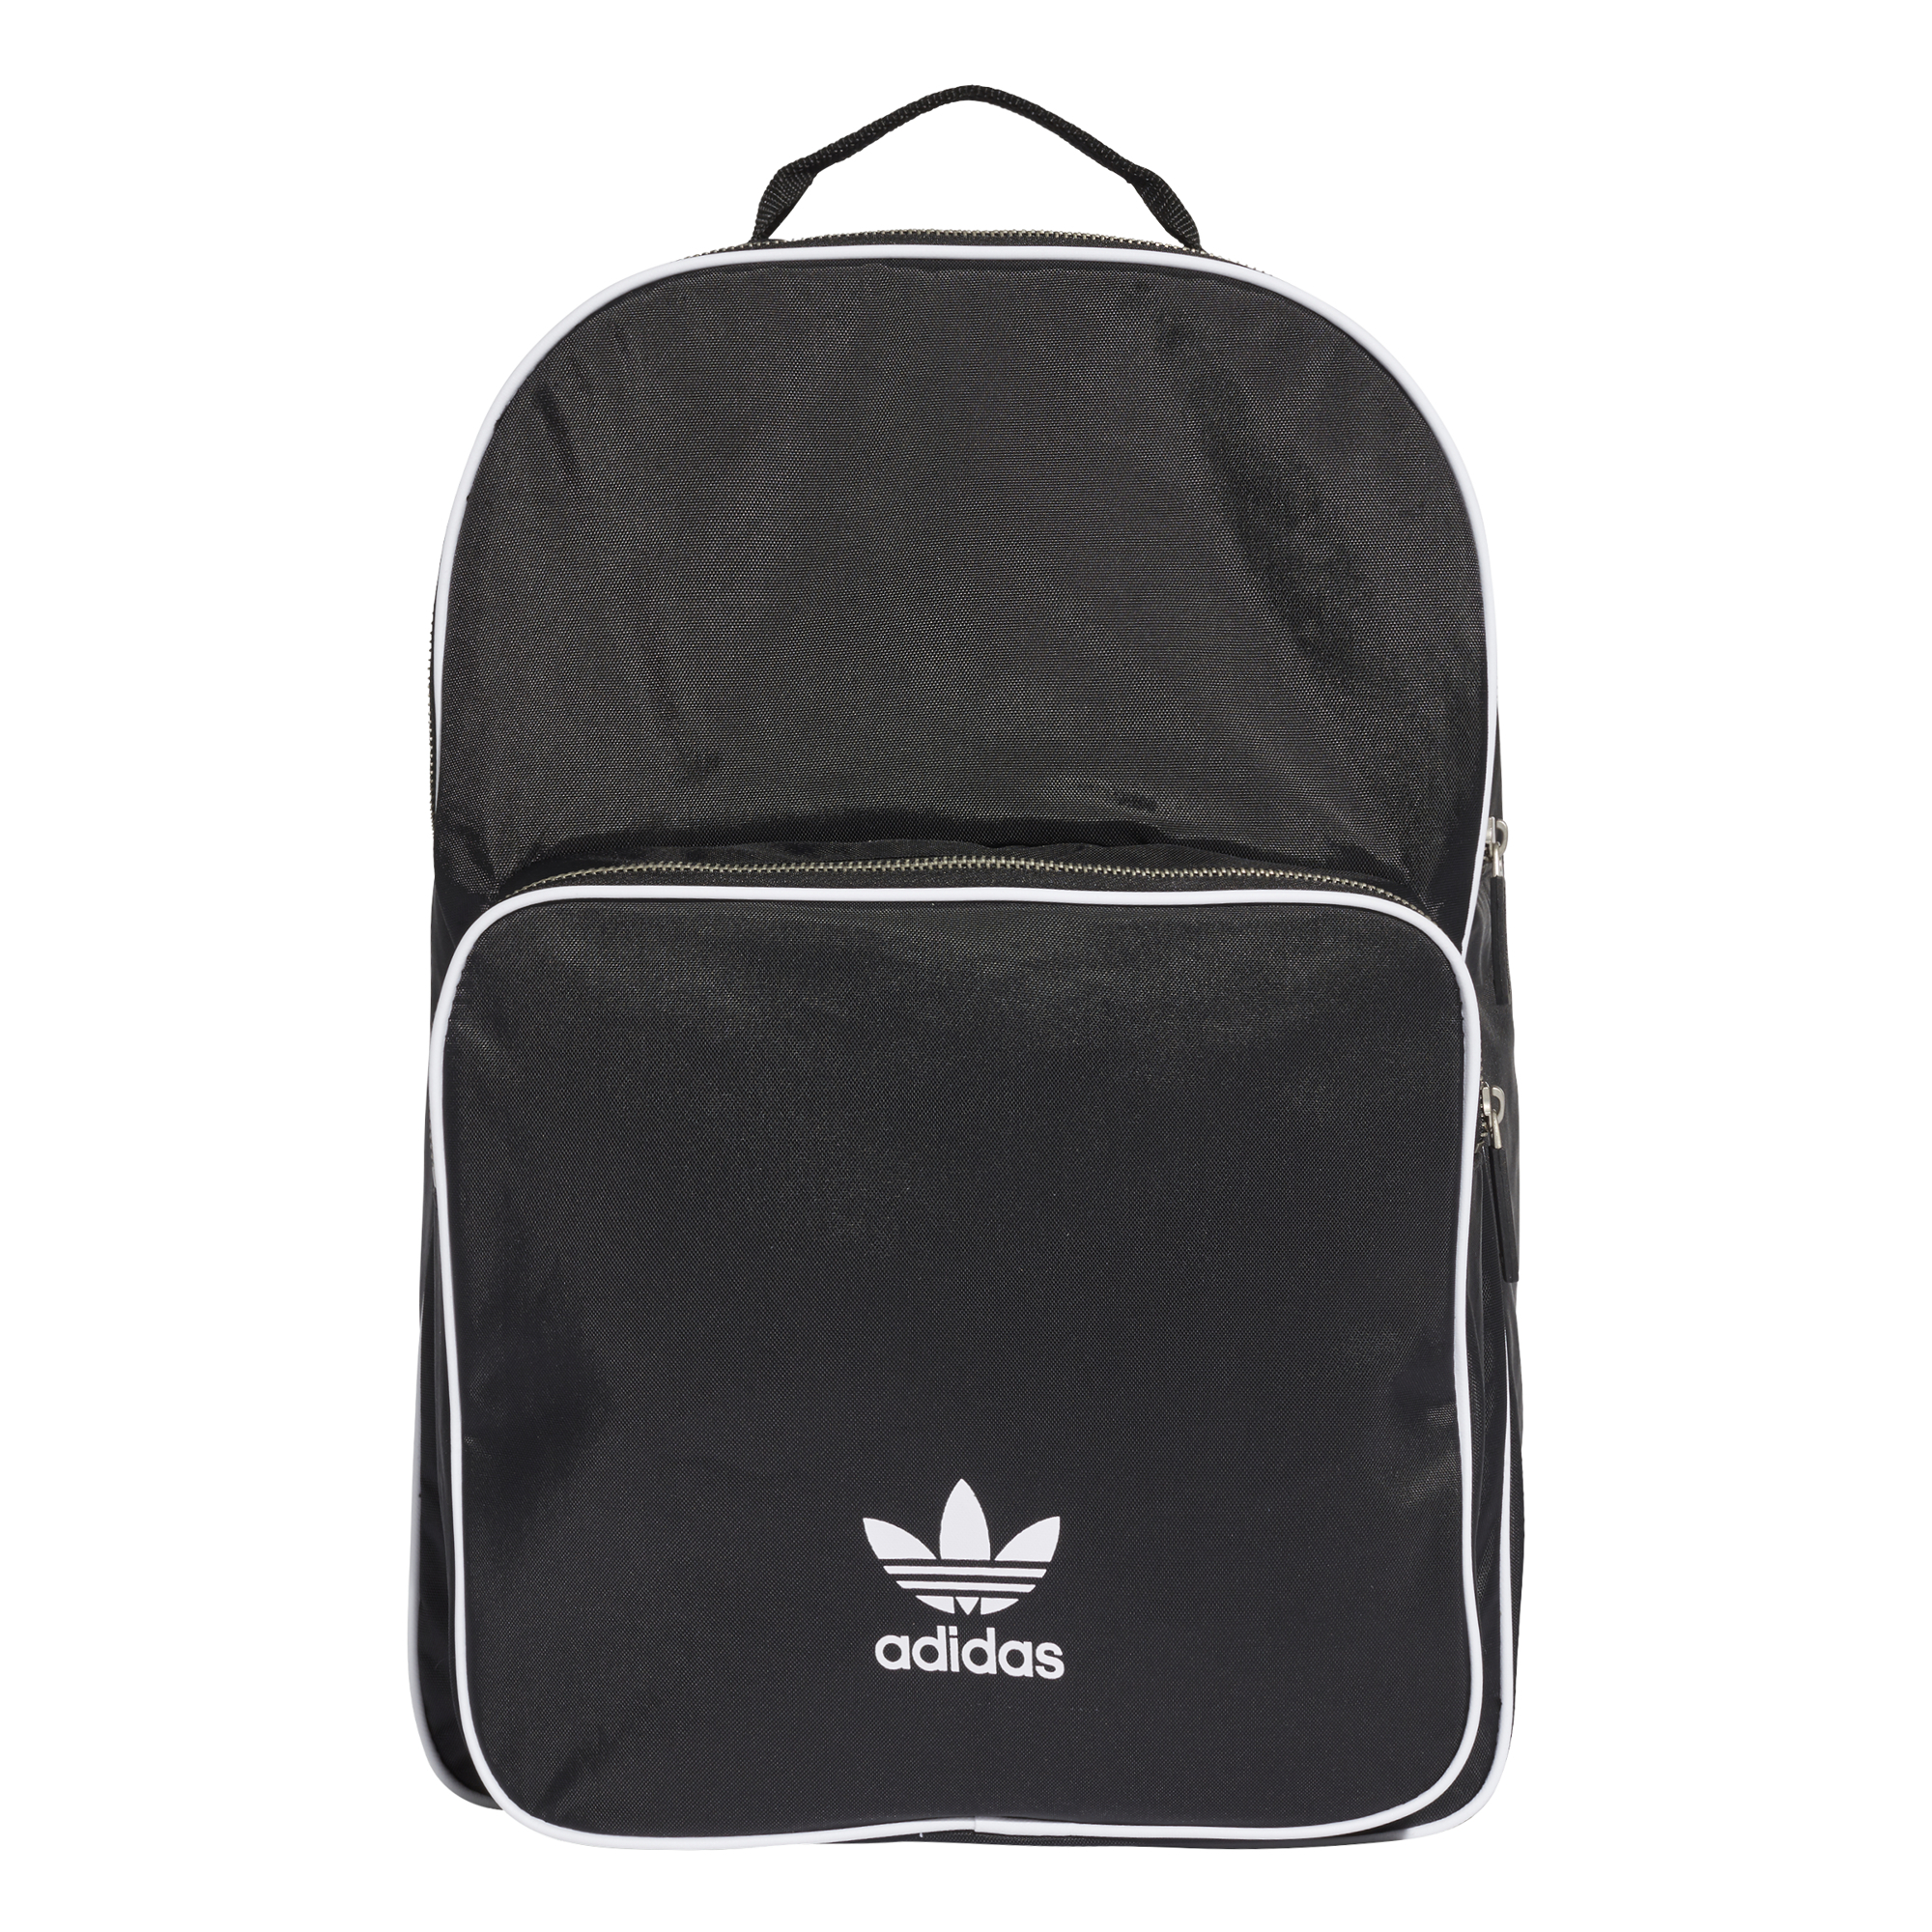 b9b3973da0c Adidas Adicolor Classic Backpack Black - Boardvillage